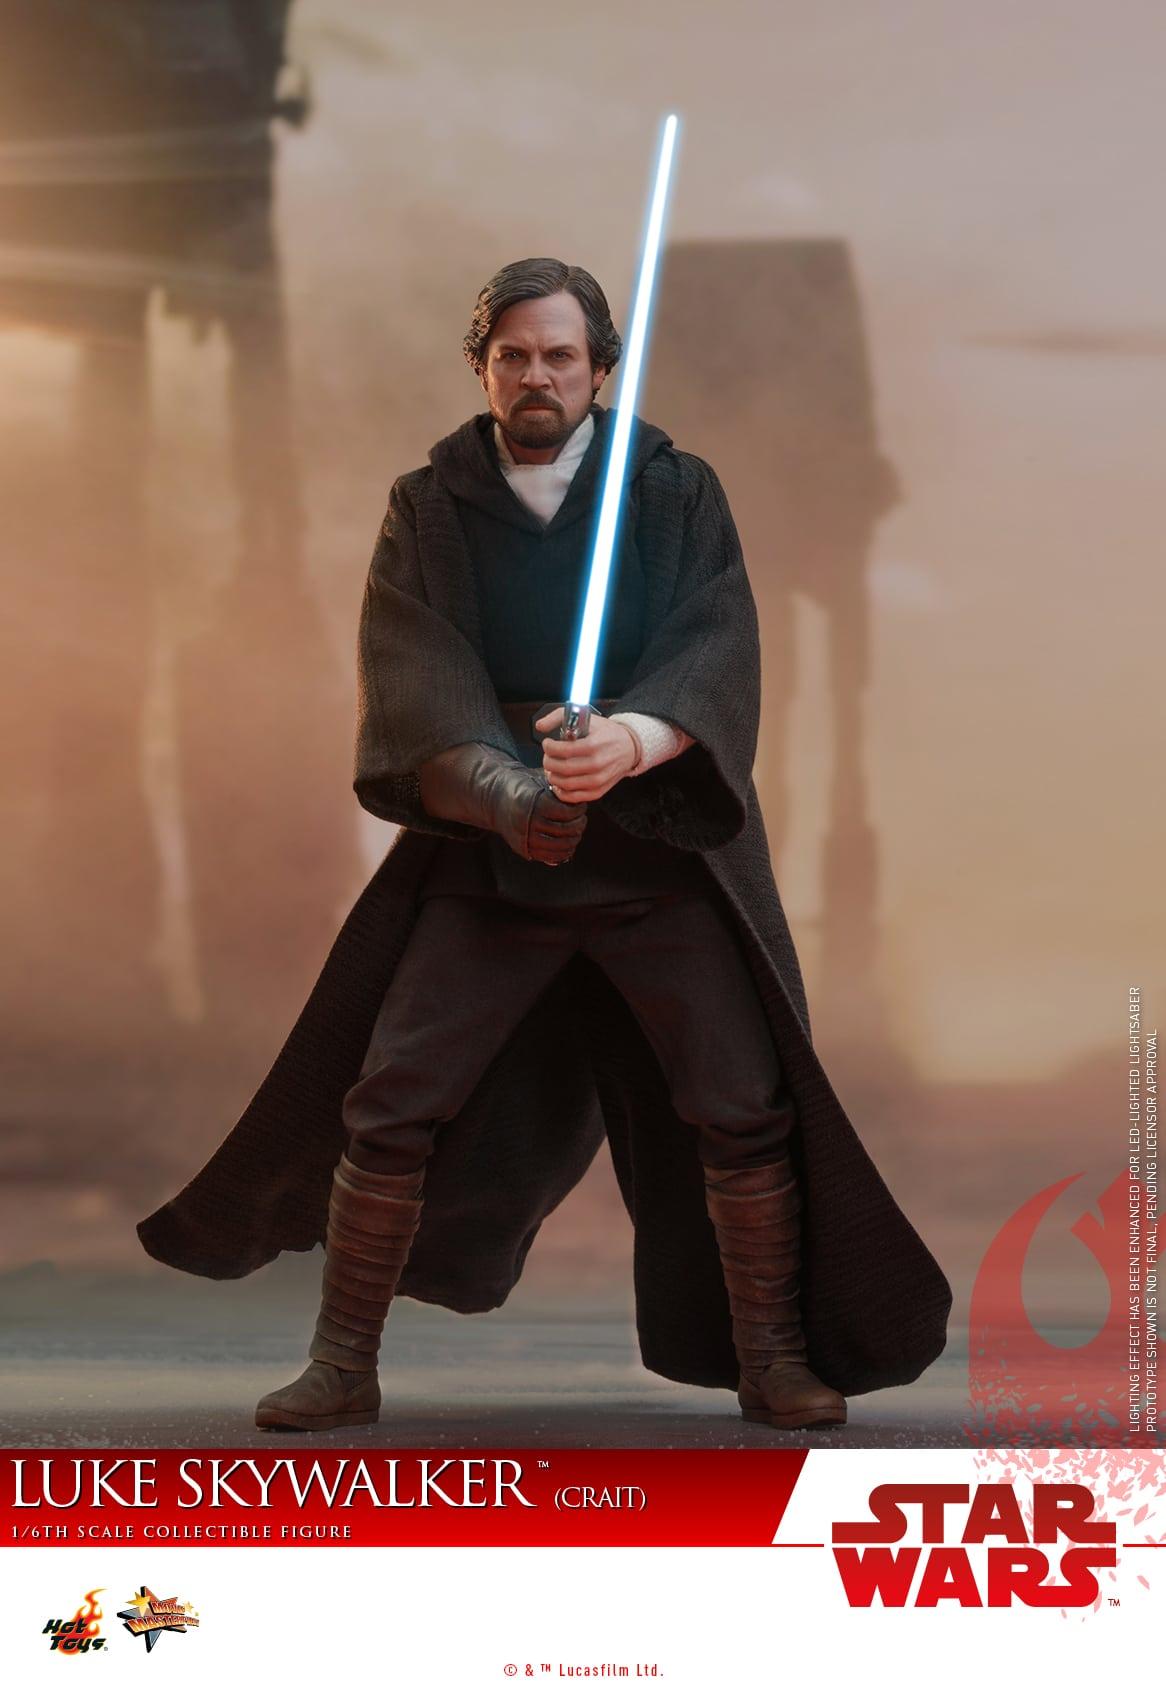 LEGO ® Star Wars 75200 Great Play-Set epvlll NUOVO /& OVP Luke Skywalker Rey porg